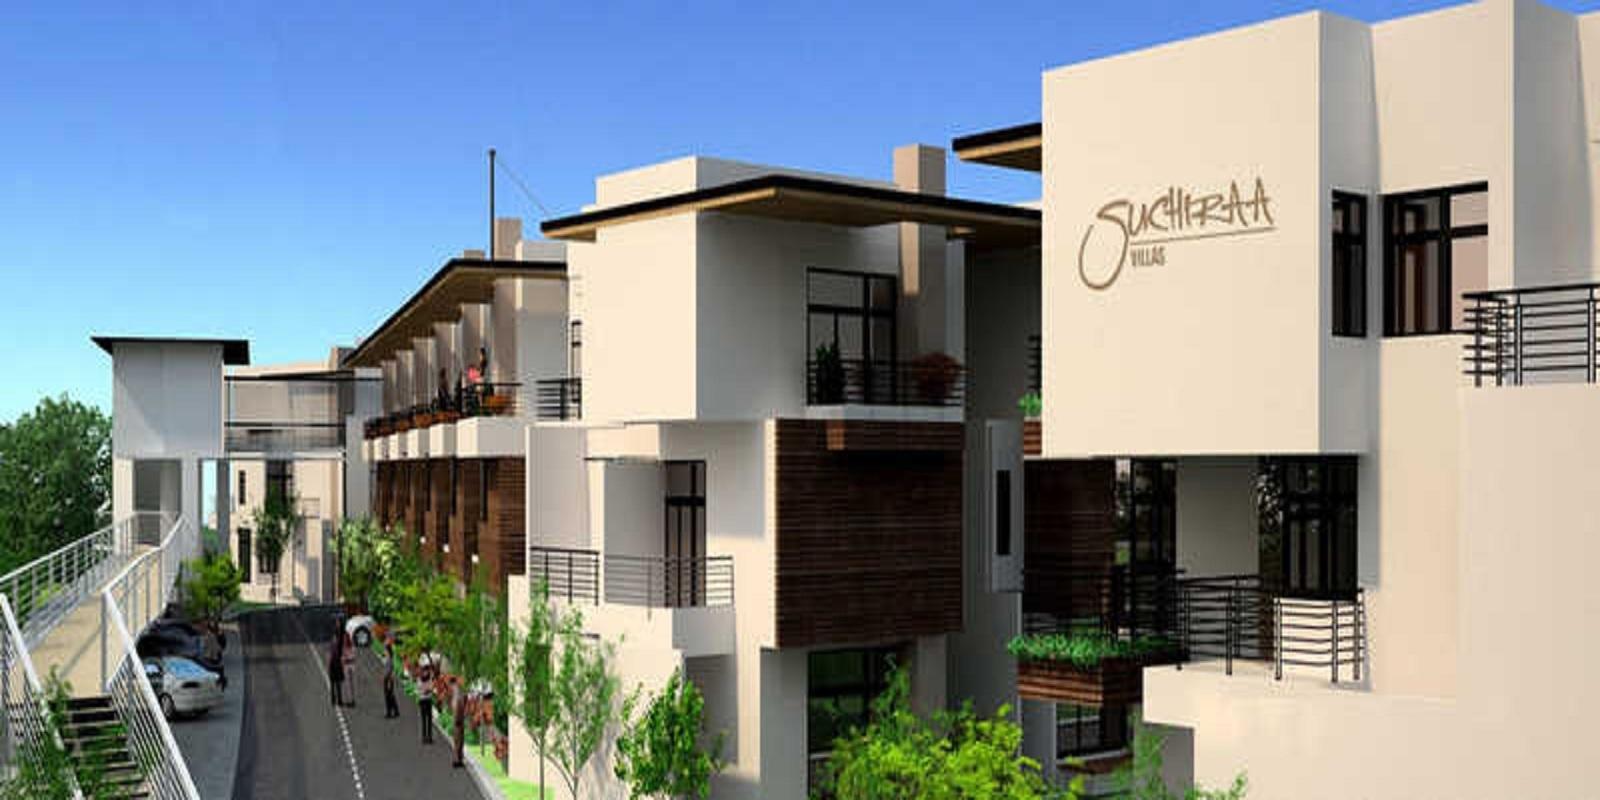 jk suchiraa villas project large image2